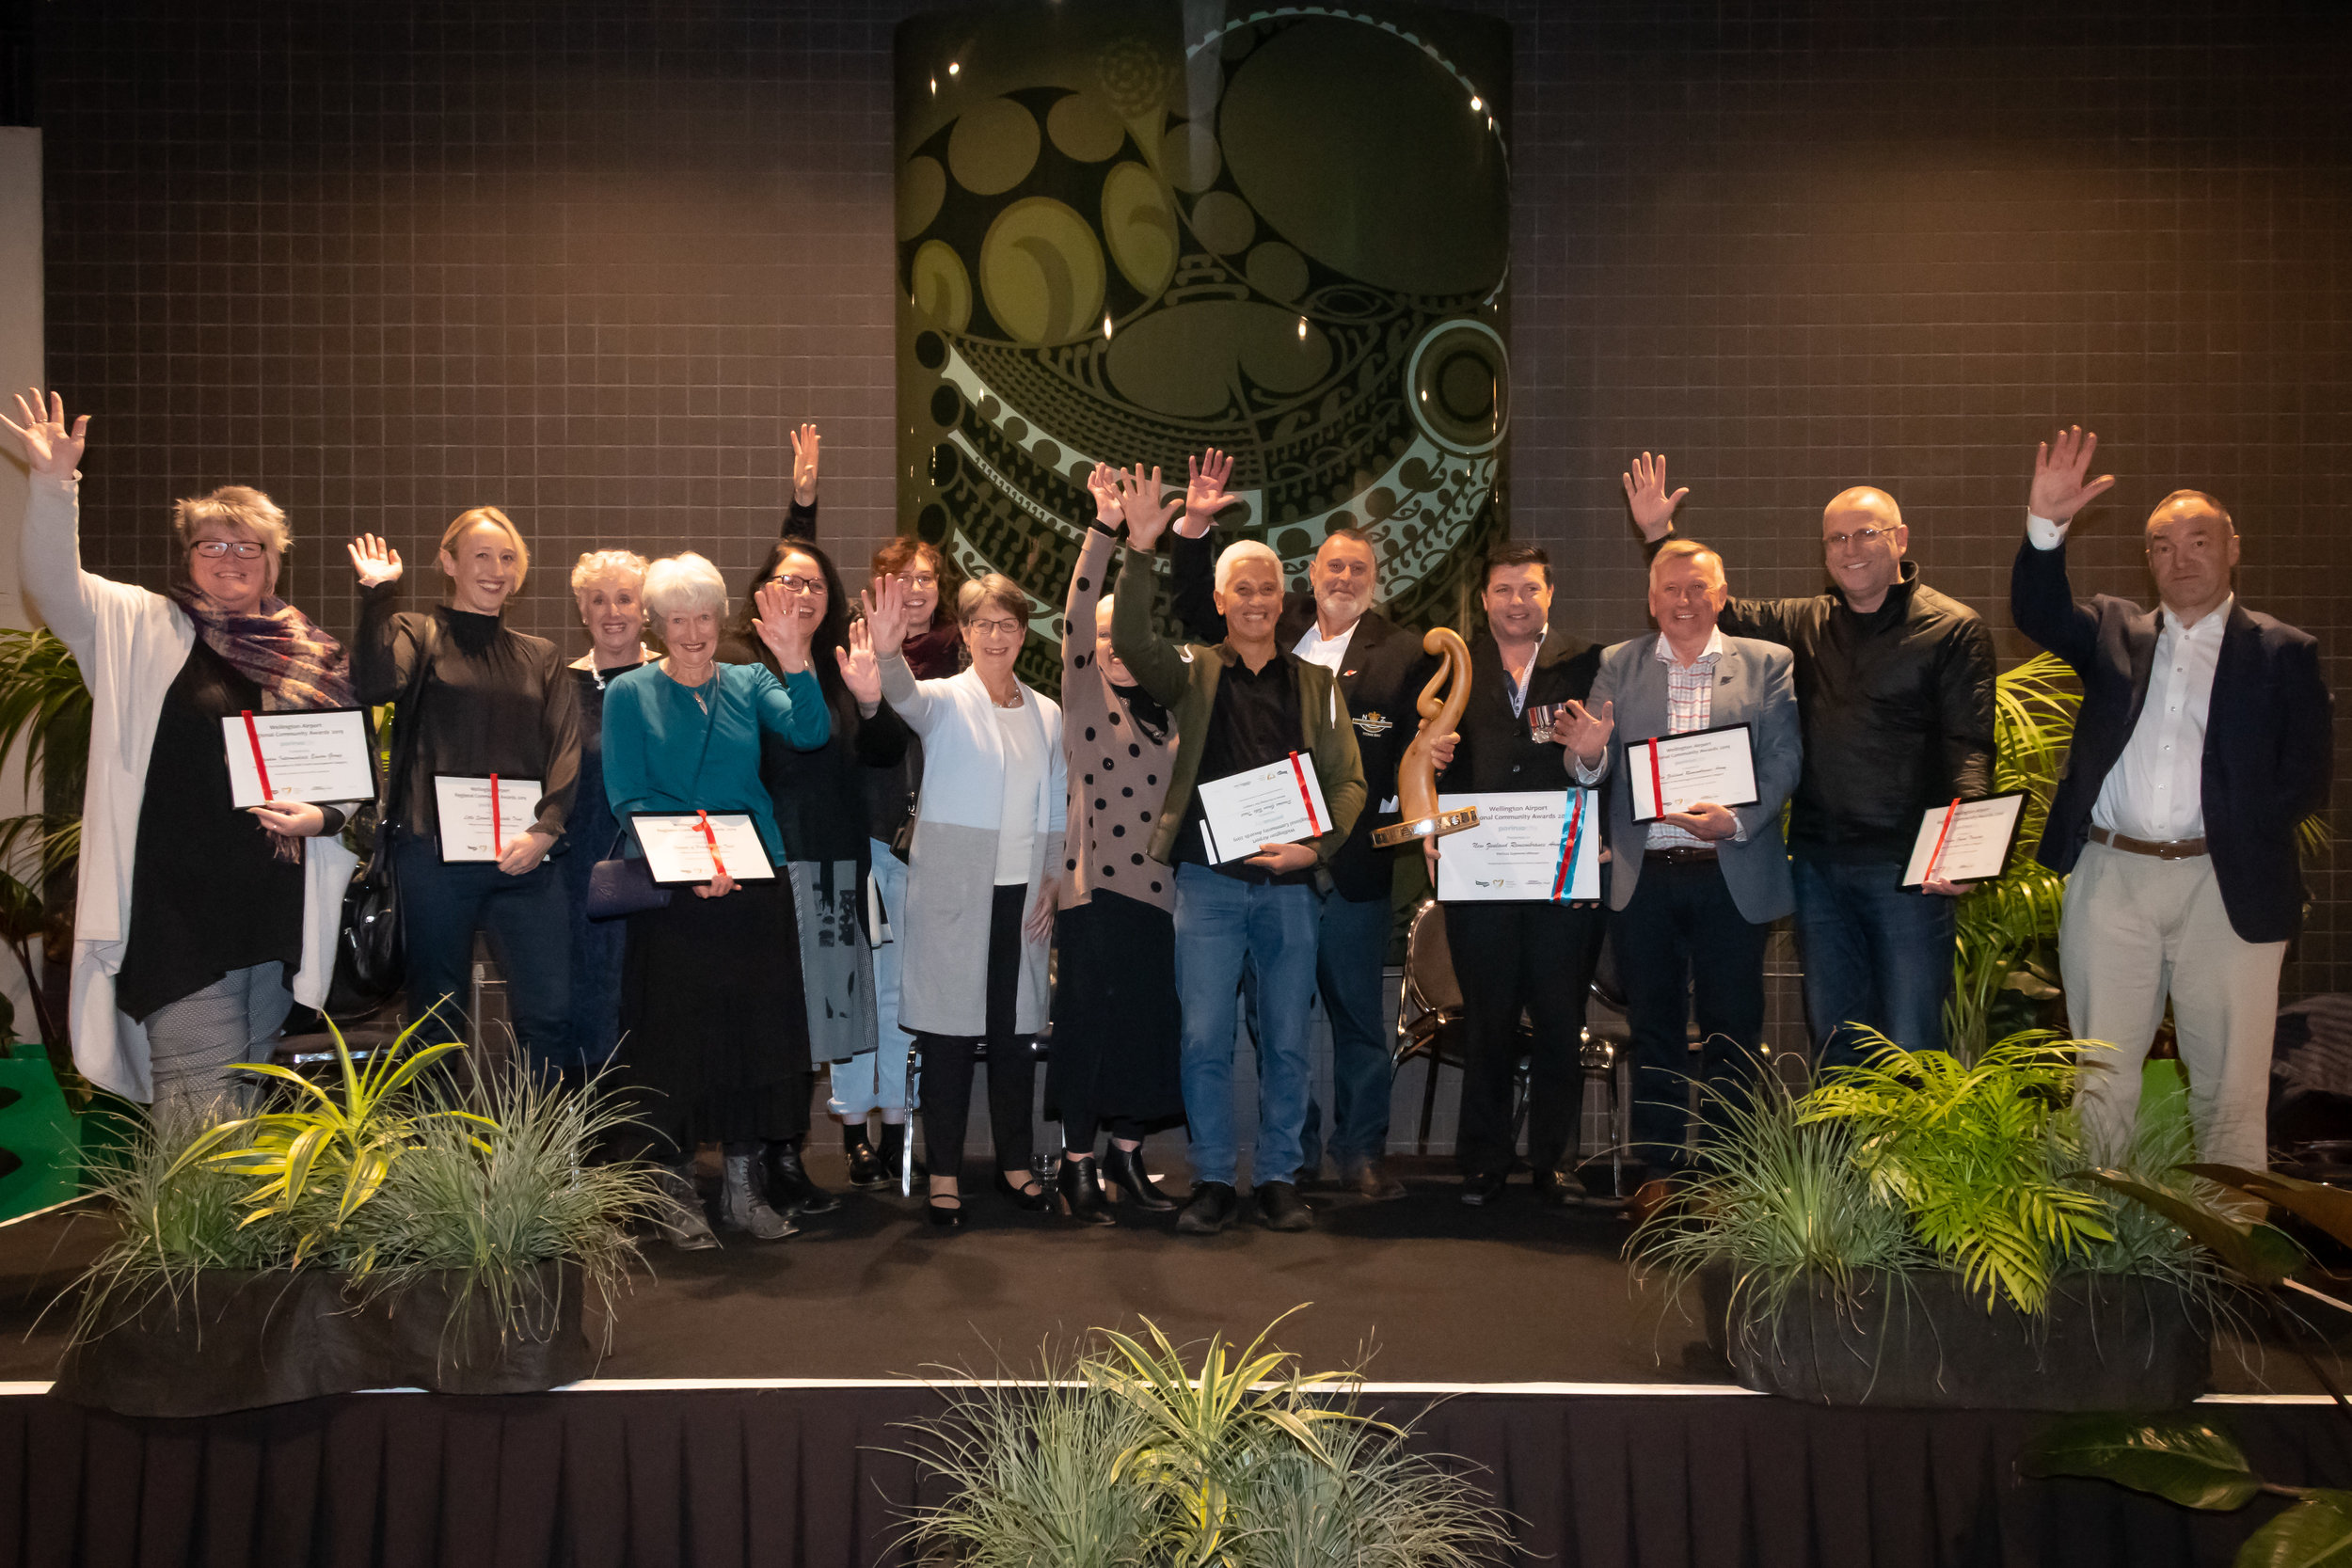 The Porirua winners of the 2019 Wellington Airport Community Awards.